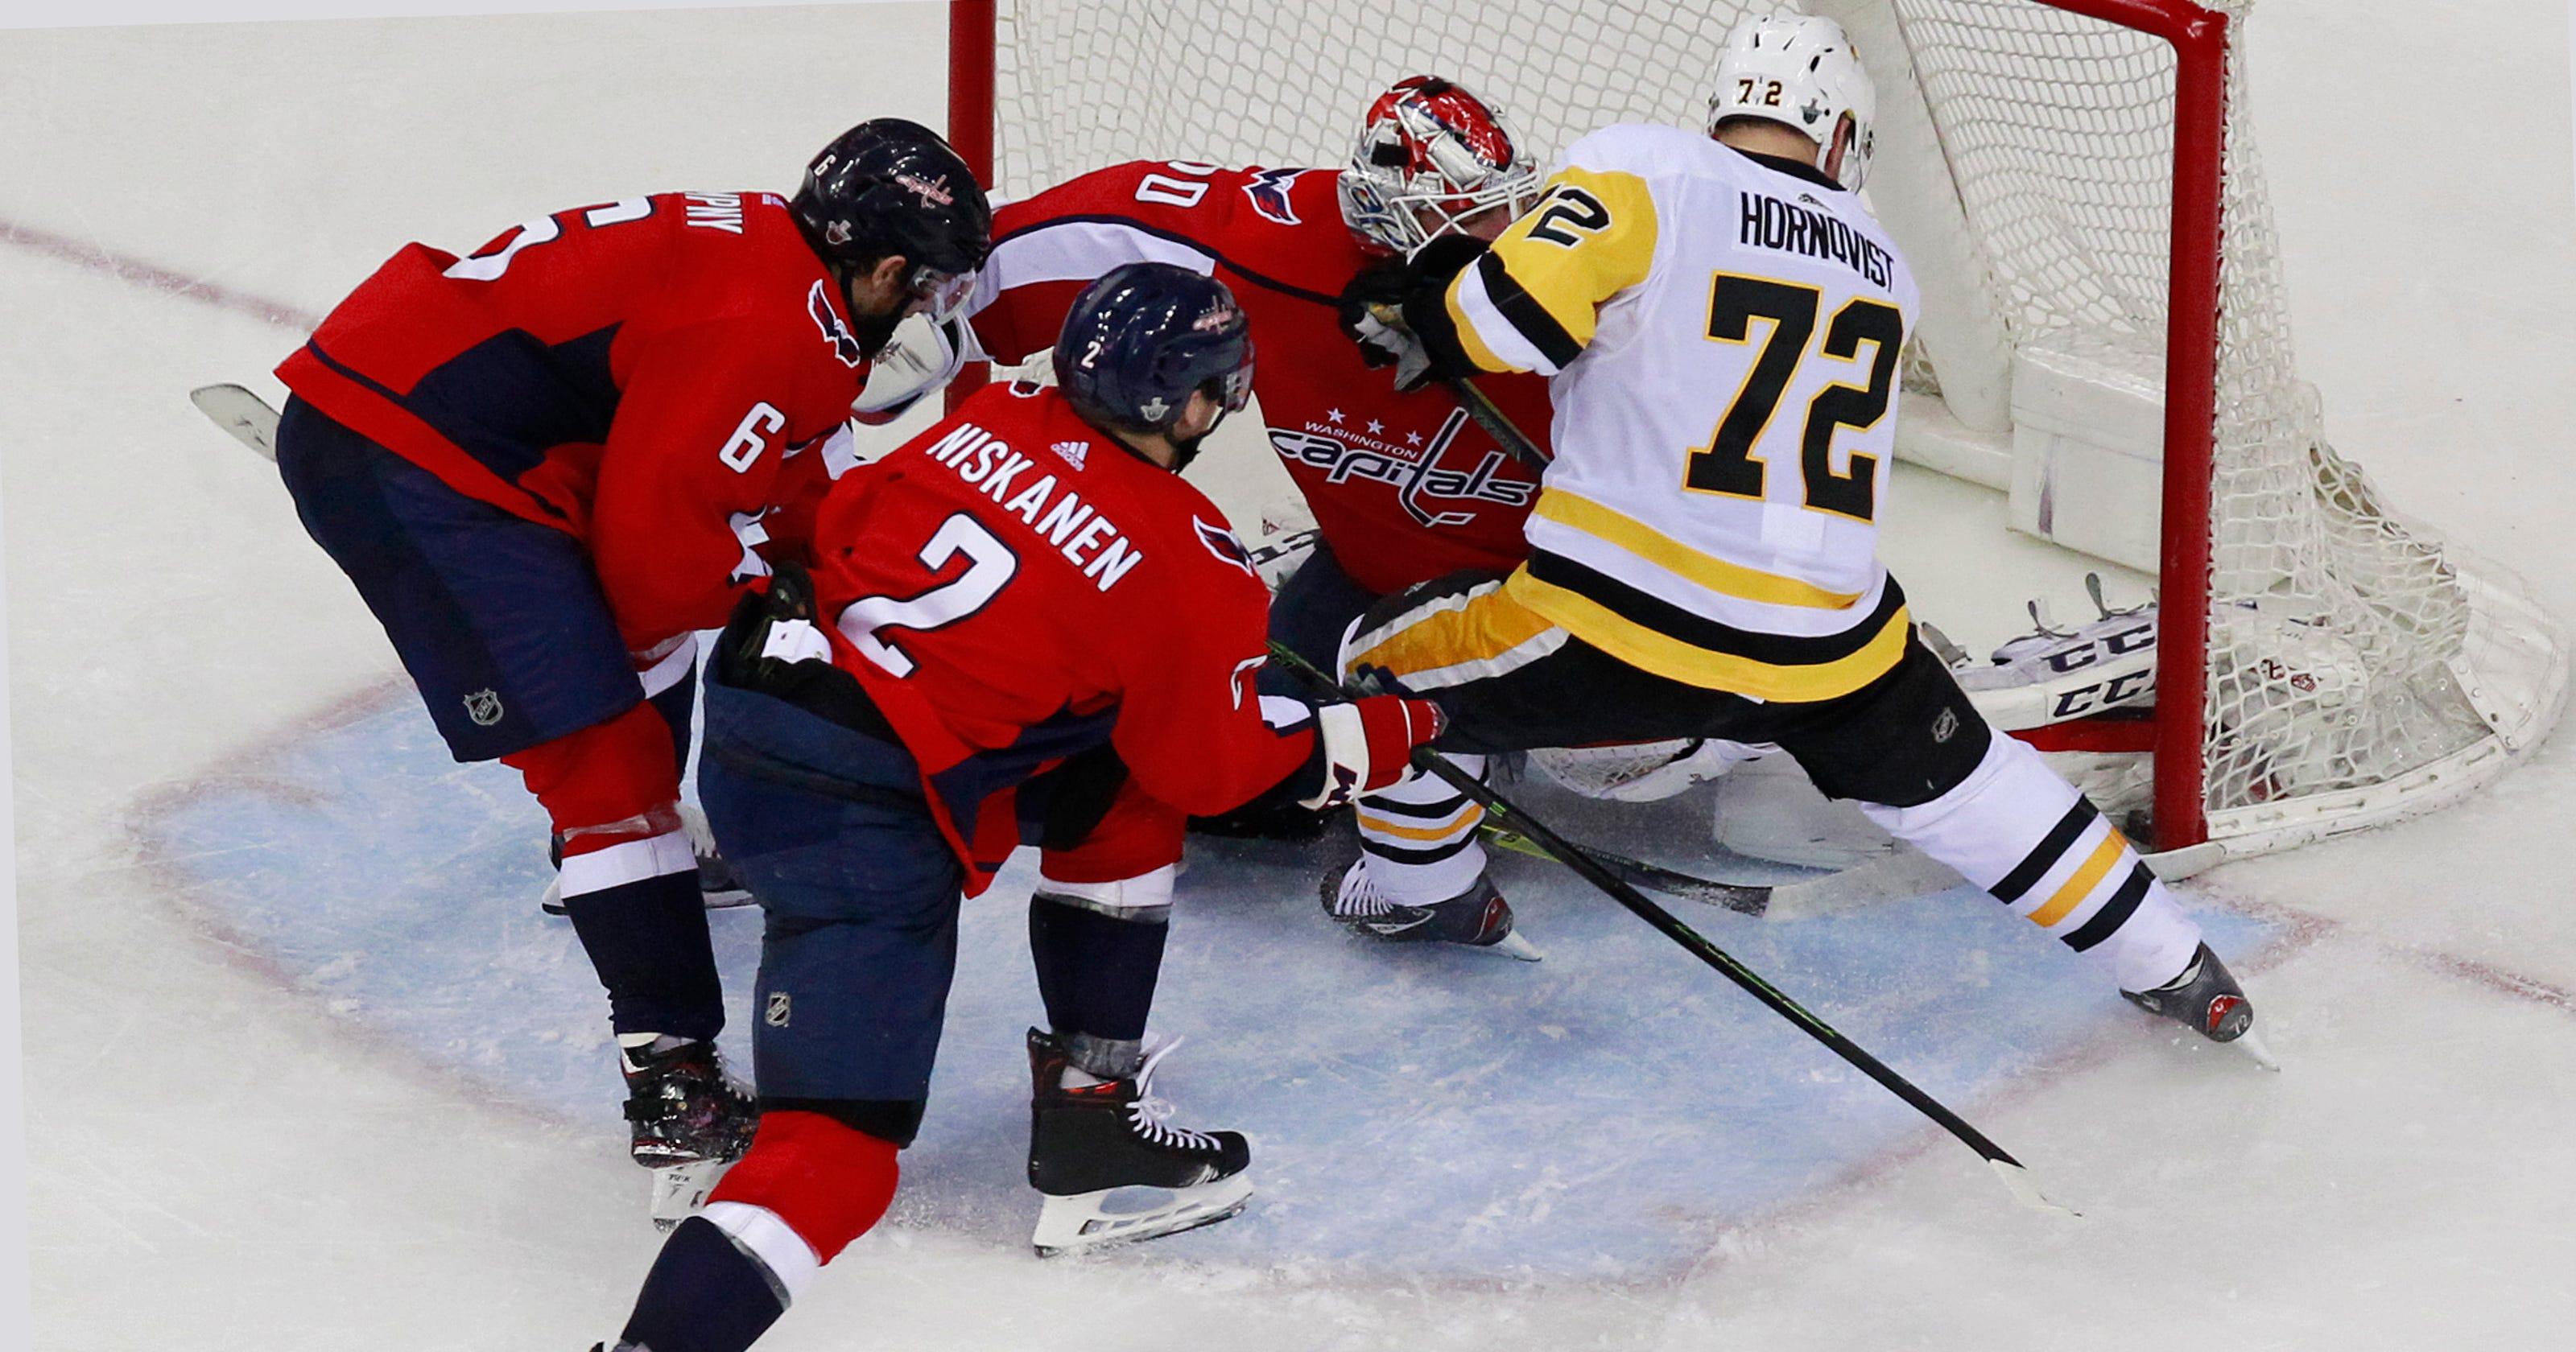 7c485ba0842 NHL playoffs  Penguins lose Dumoulin